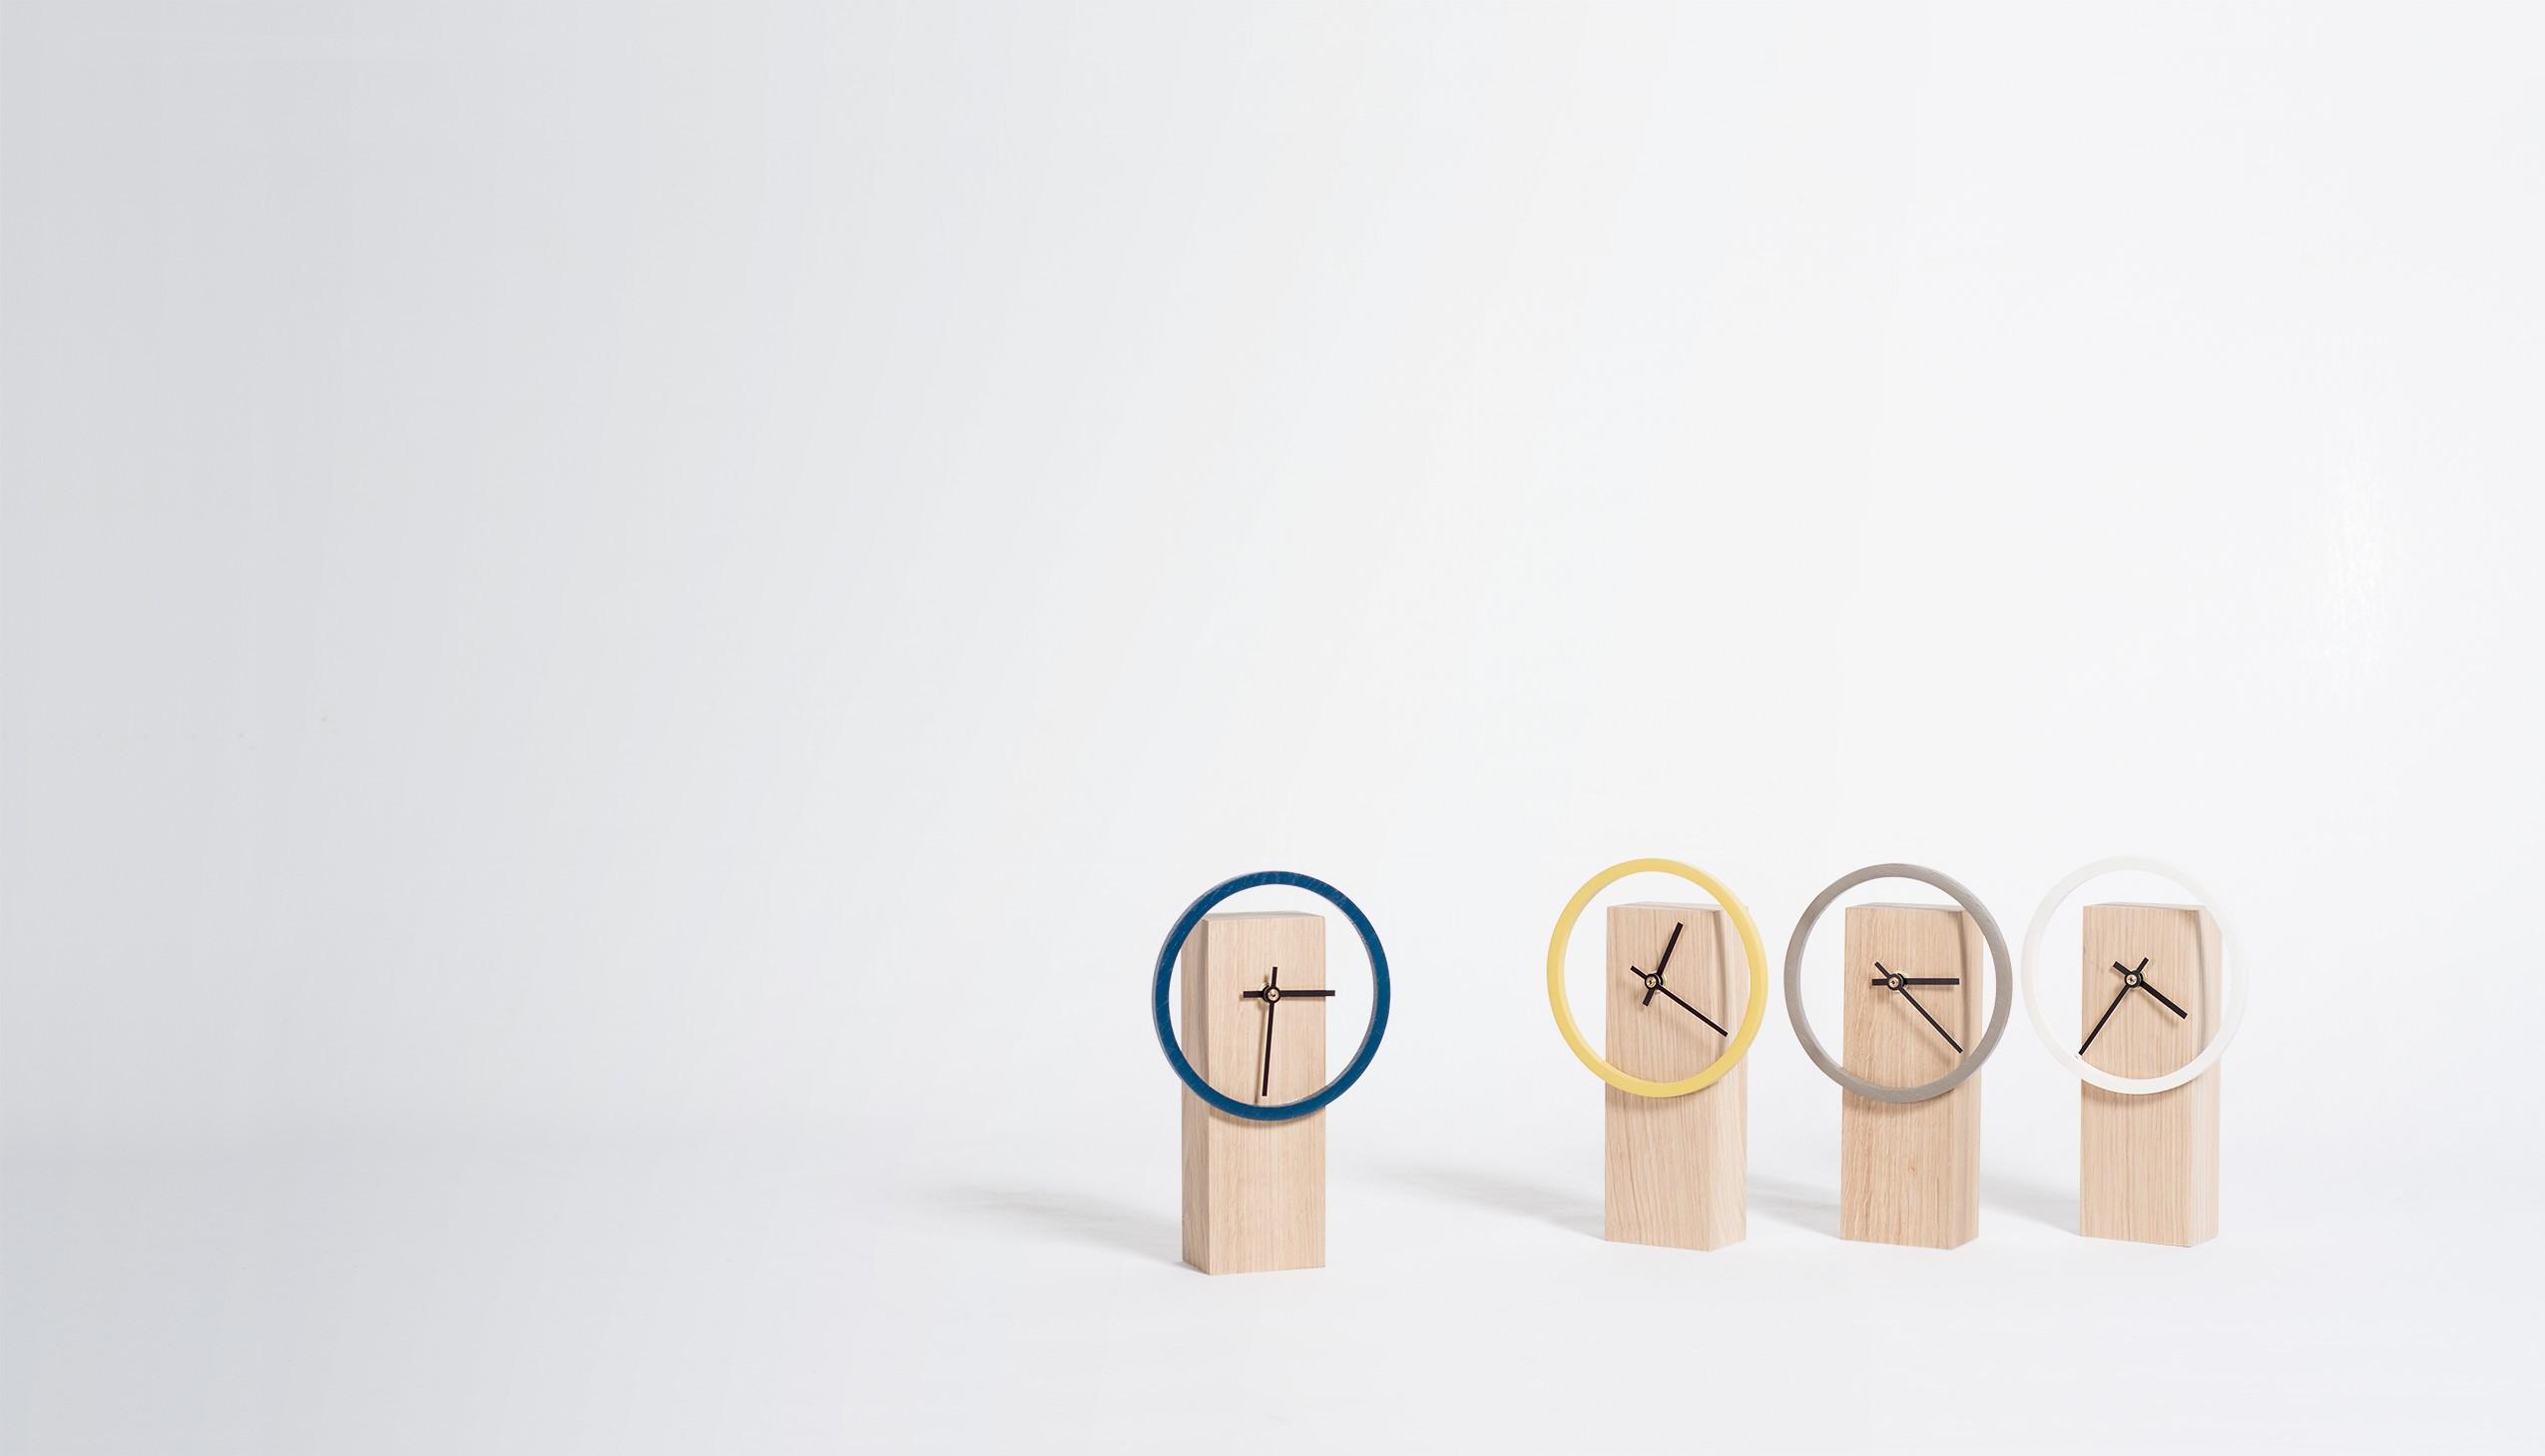 horloge chene massif cadran couleur design drugeot manufacture cyclock. Black Bedroom Furniture Sets. Home Design Ideas